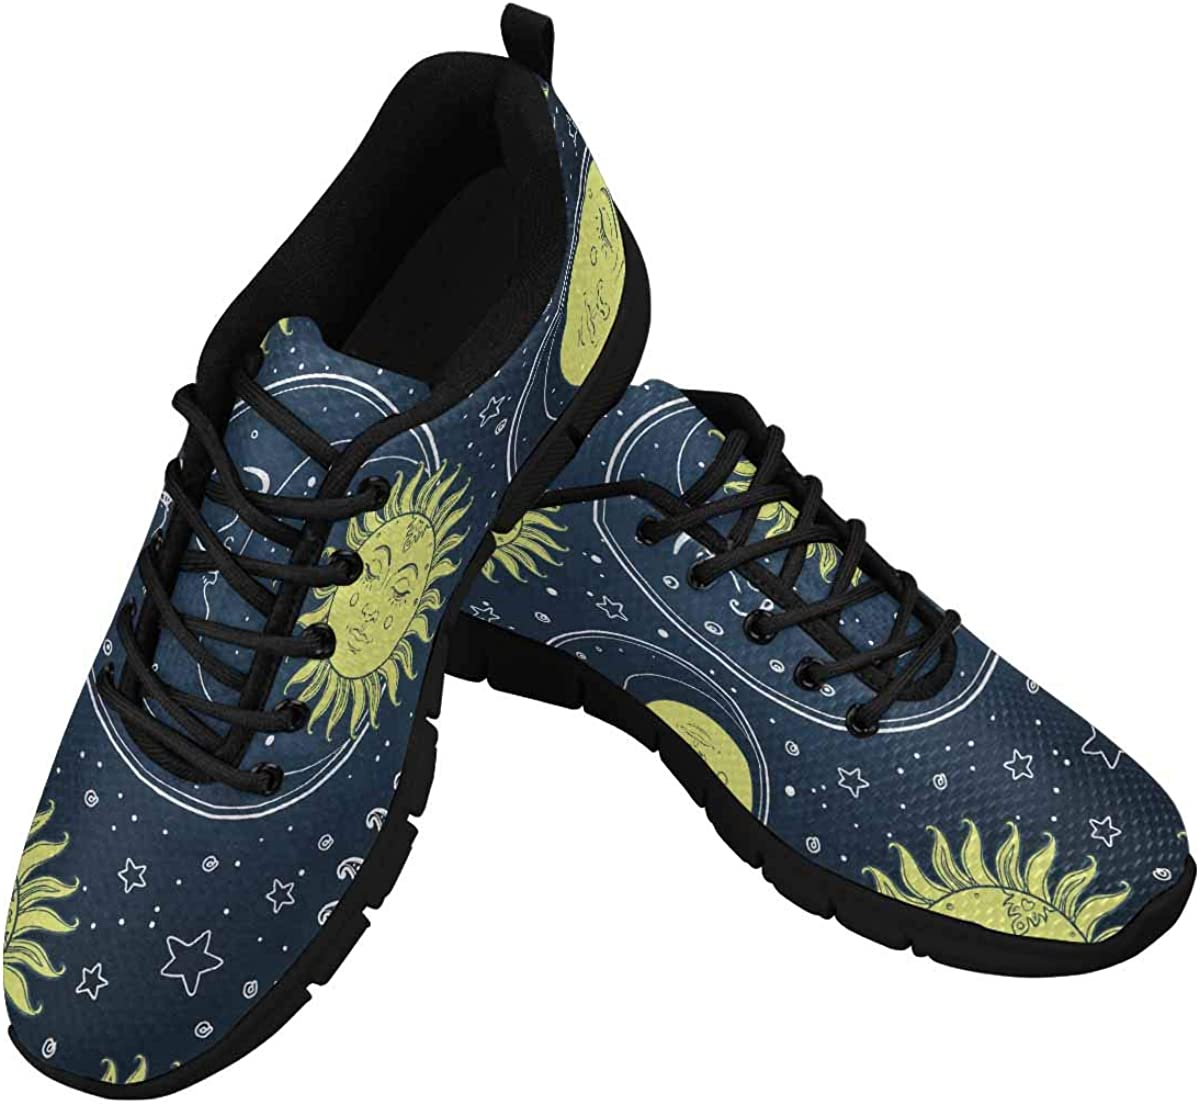 InterestPrint Sun and Moon Stars Golden Women's Athletic Walking Shoes Comfort Mesh Non Slip